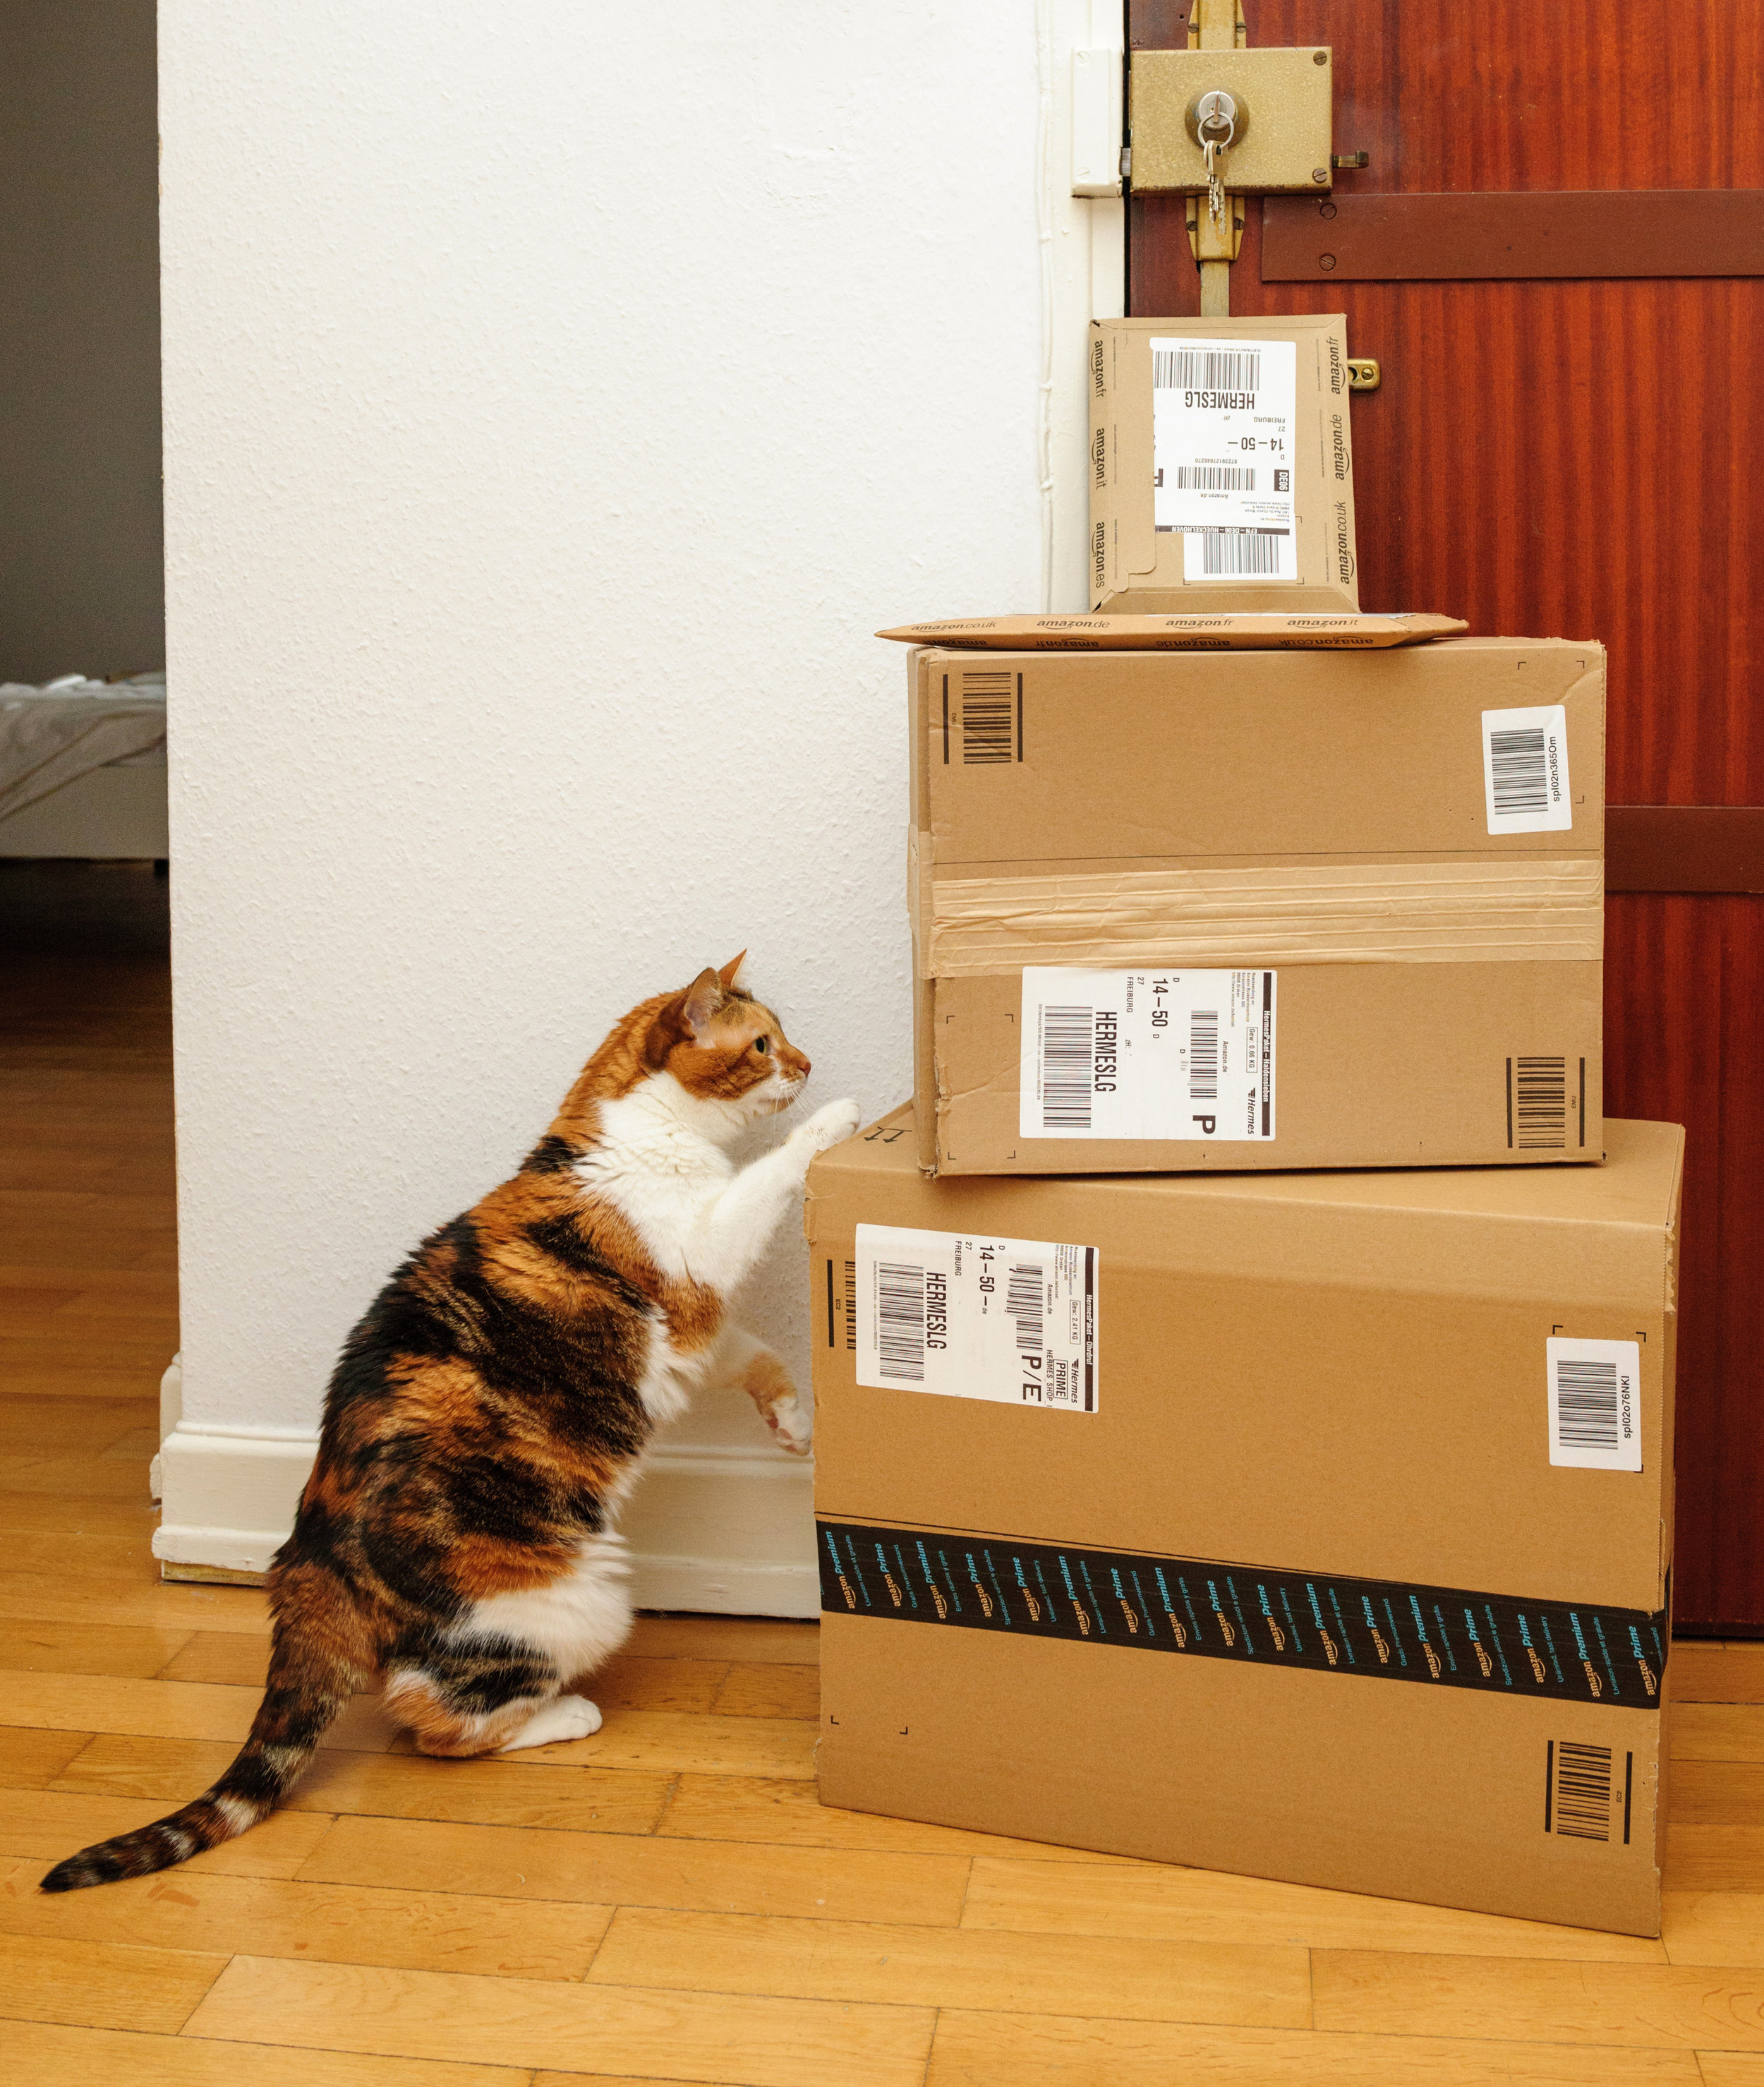 Curious-cat-inspecting-multiple-Amazon-Prime-boxes-636699124_3411x4034.jpeg